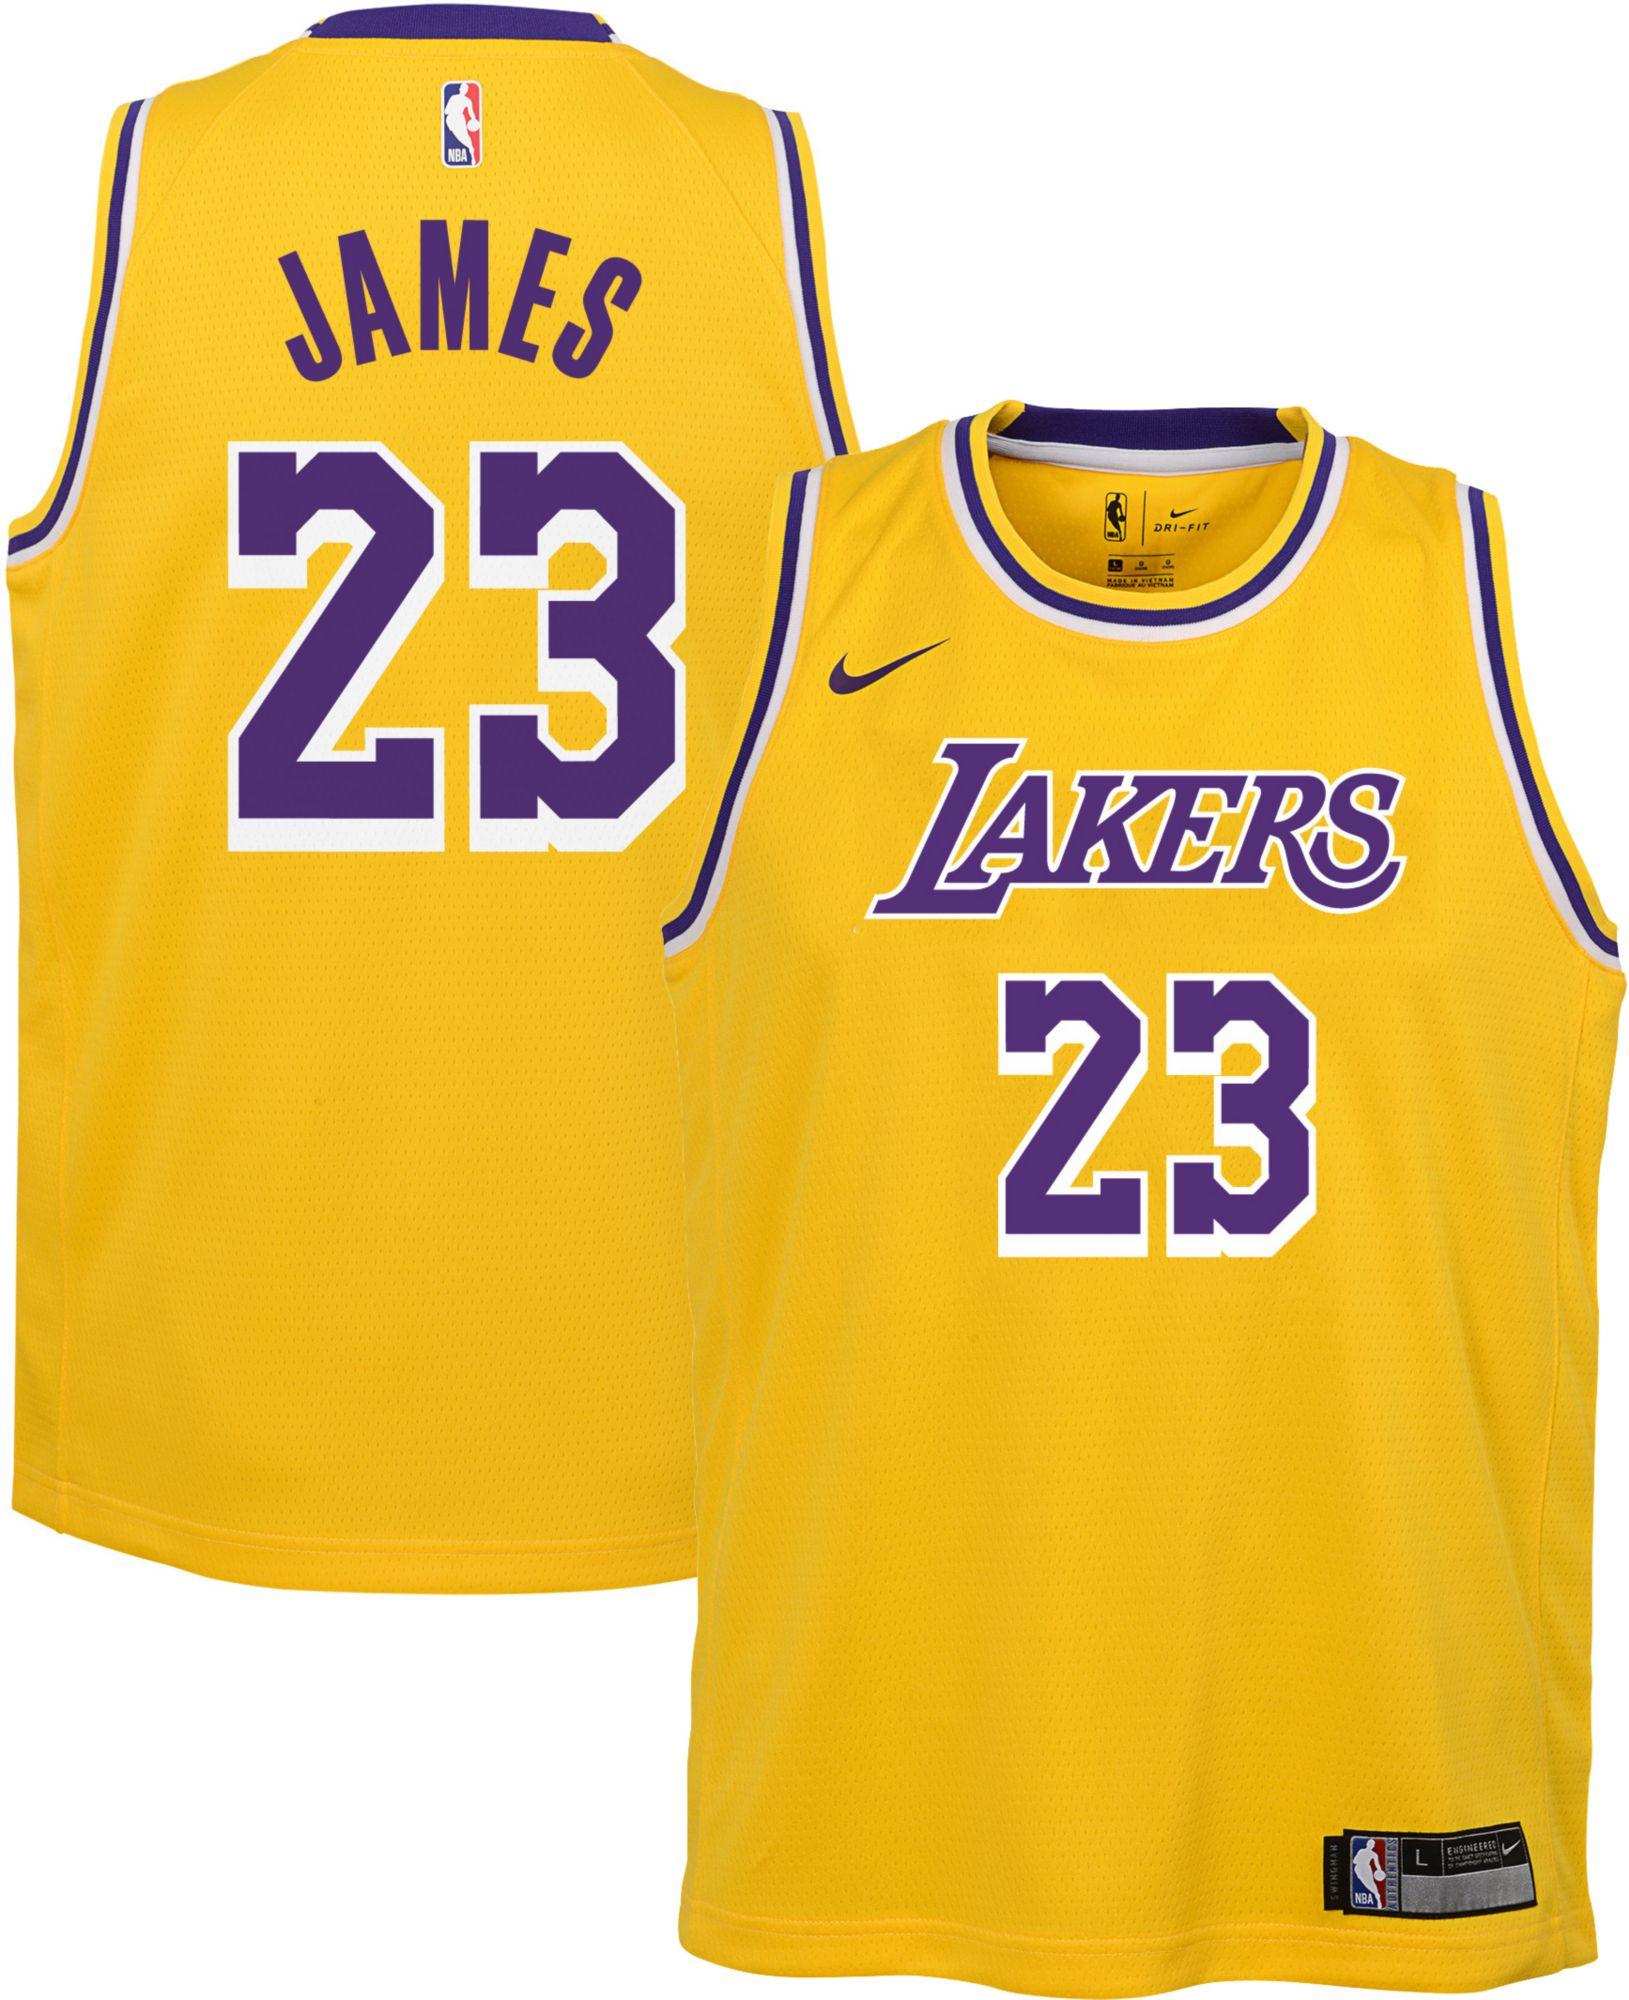 lebron james jersey number